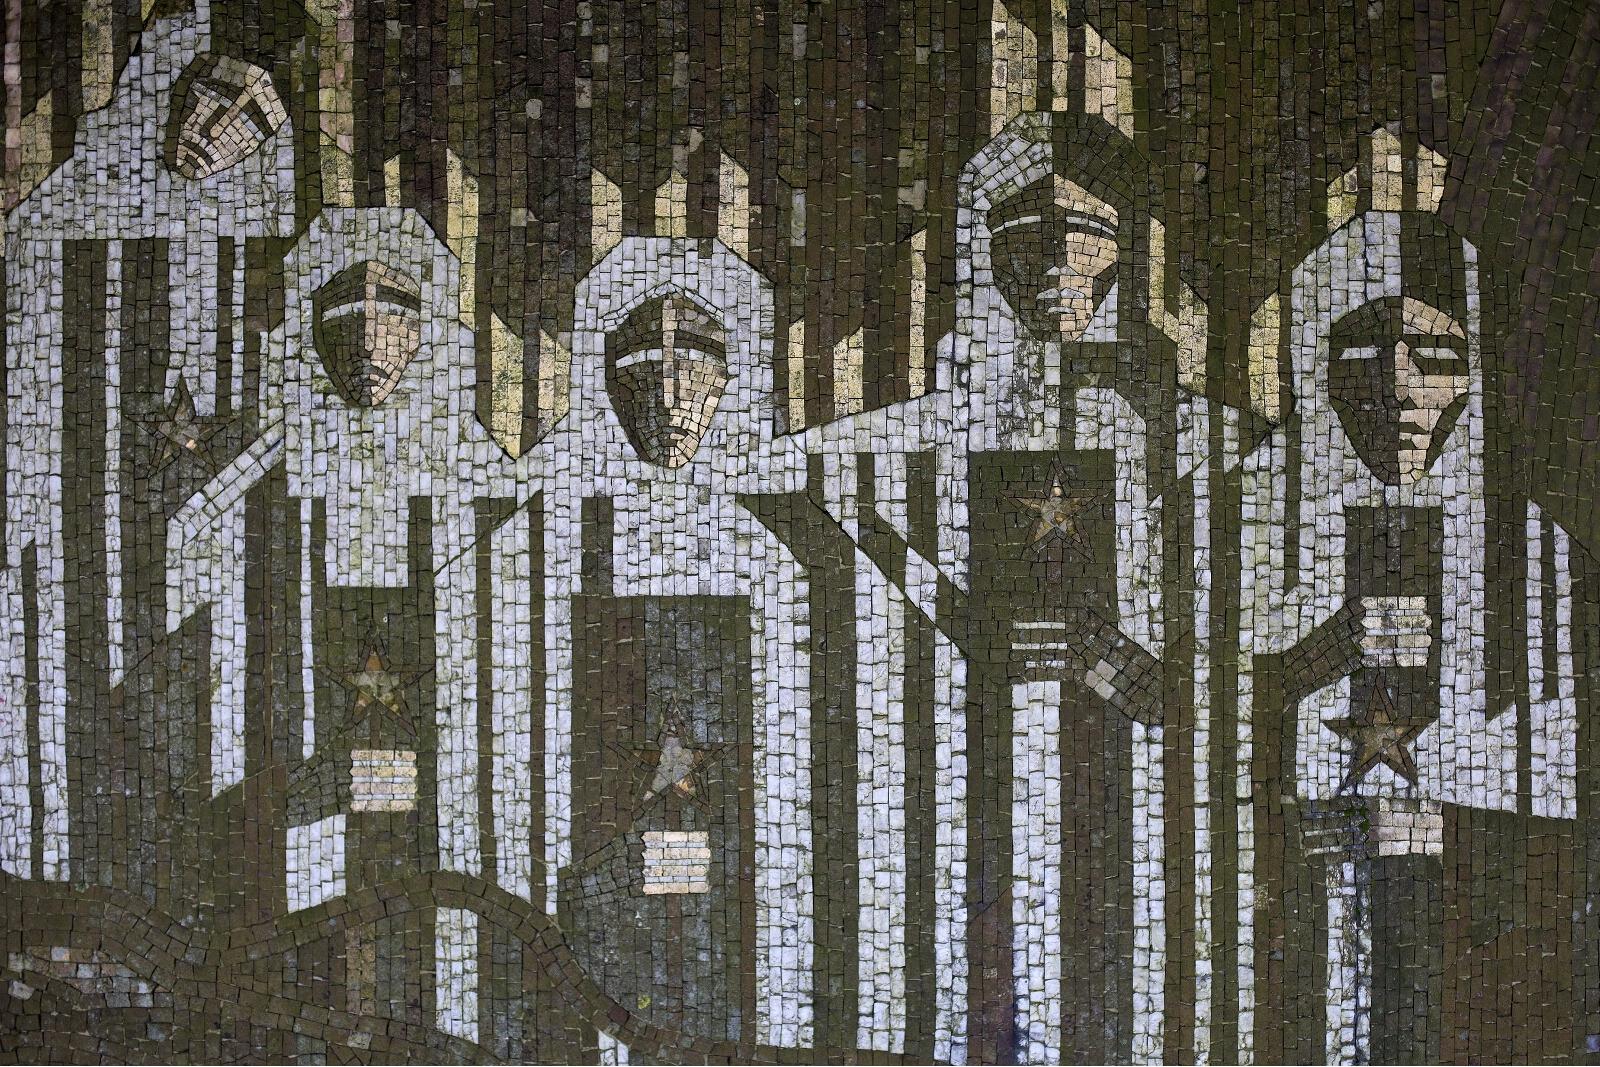 Buzludzha memorial house mosaic